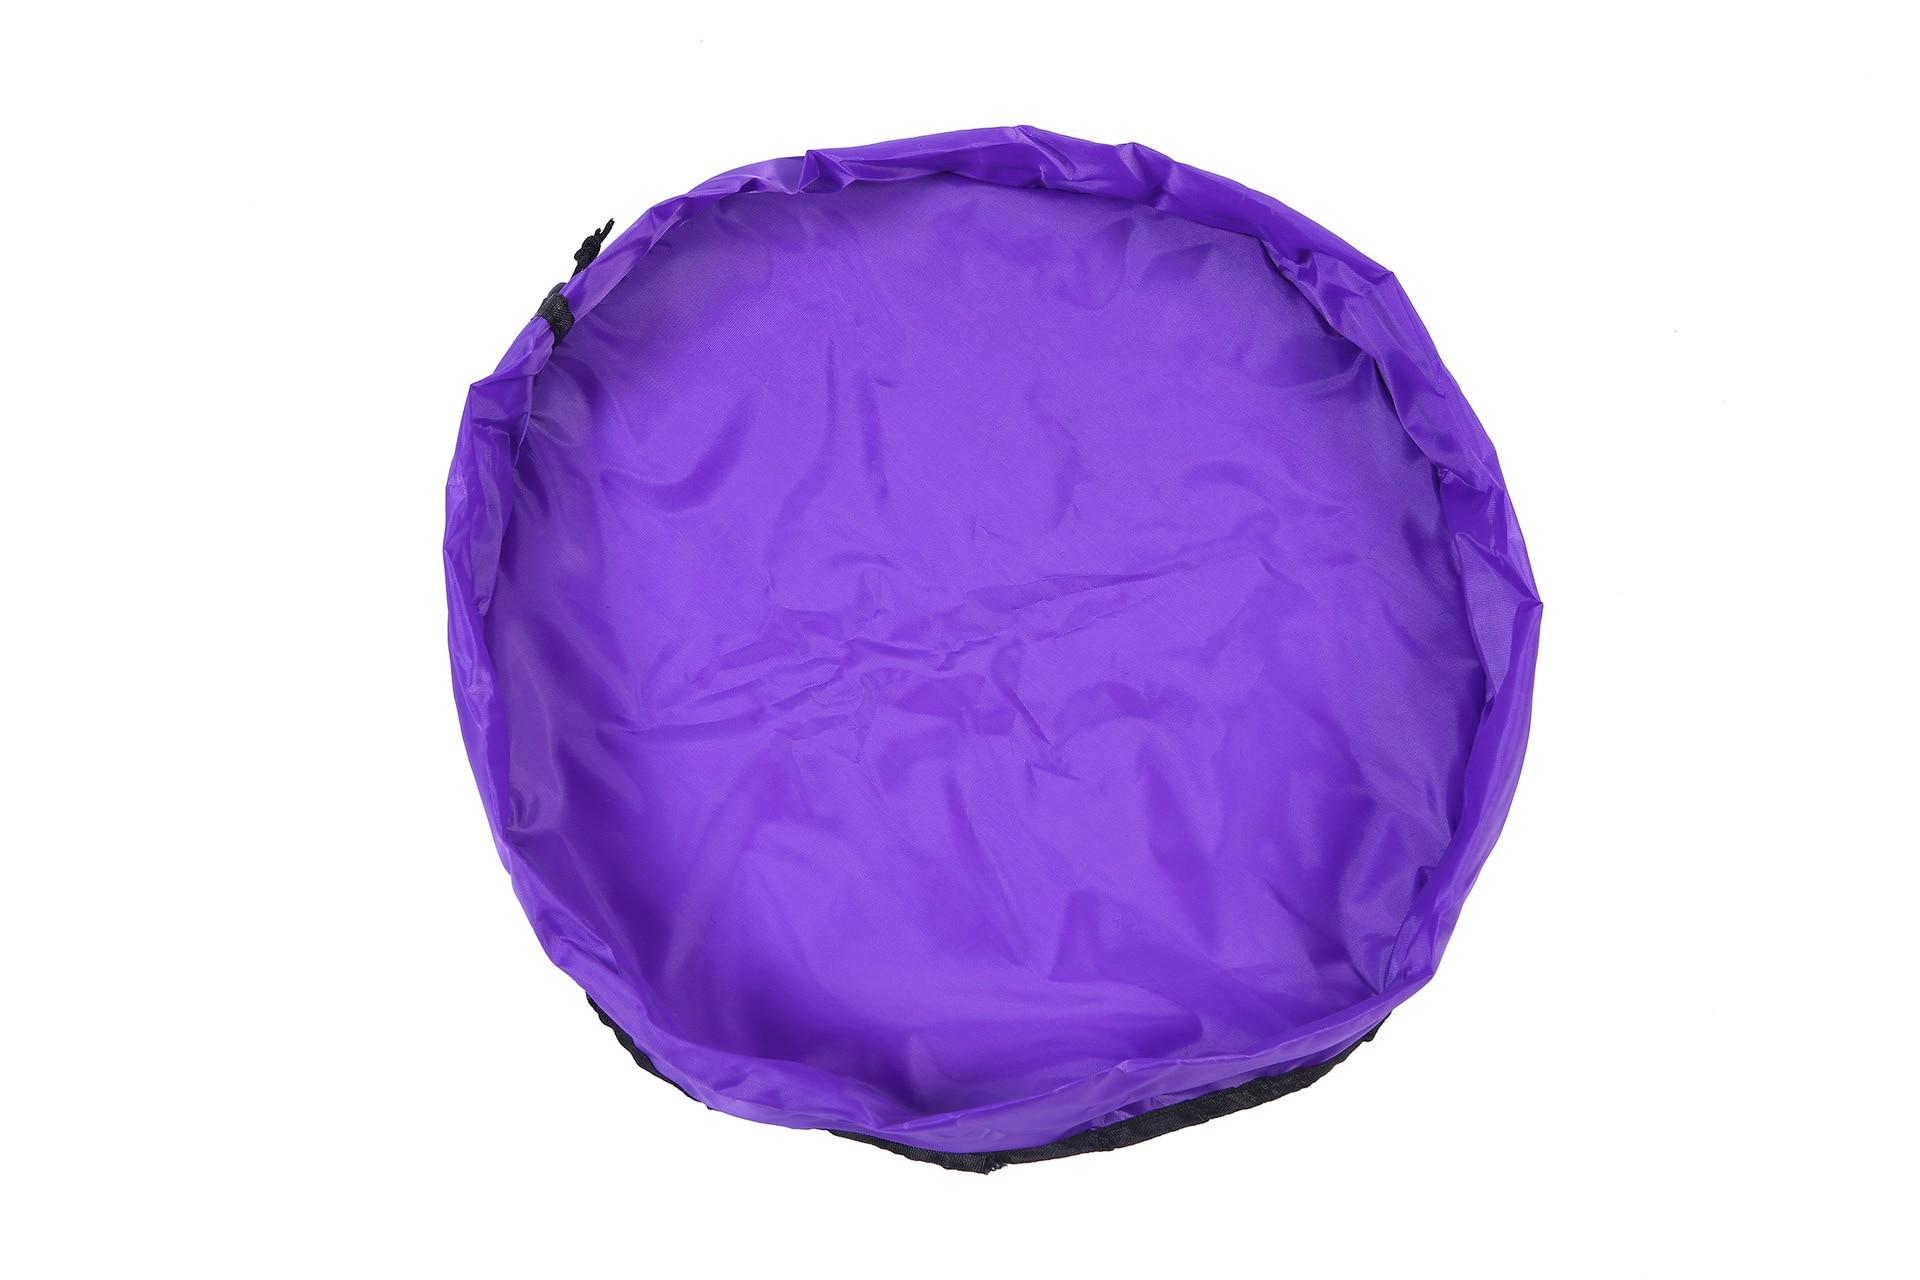 H94921e5b16fd4dd895c597b0a6c0f5e3a 2020 Multifunctional baby toy fast storage bag play mat outdoor children's waterproof toy mat beam storage bag beach mat